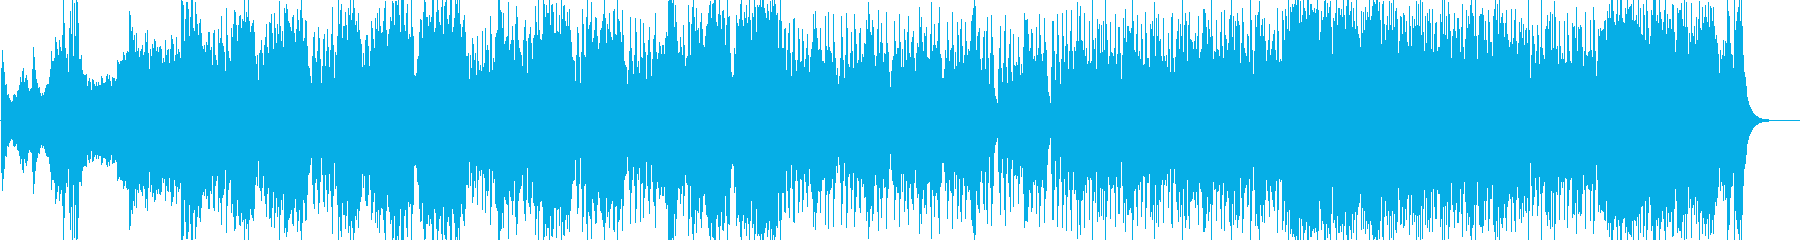 RPGなどの戦いを想定したオーケストラ。の再生済みの波形